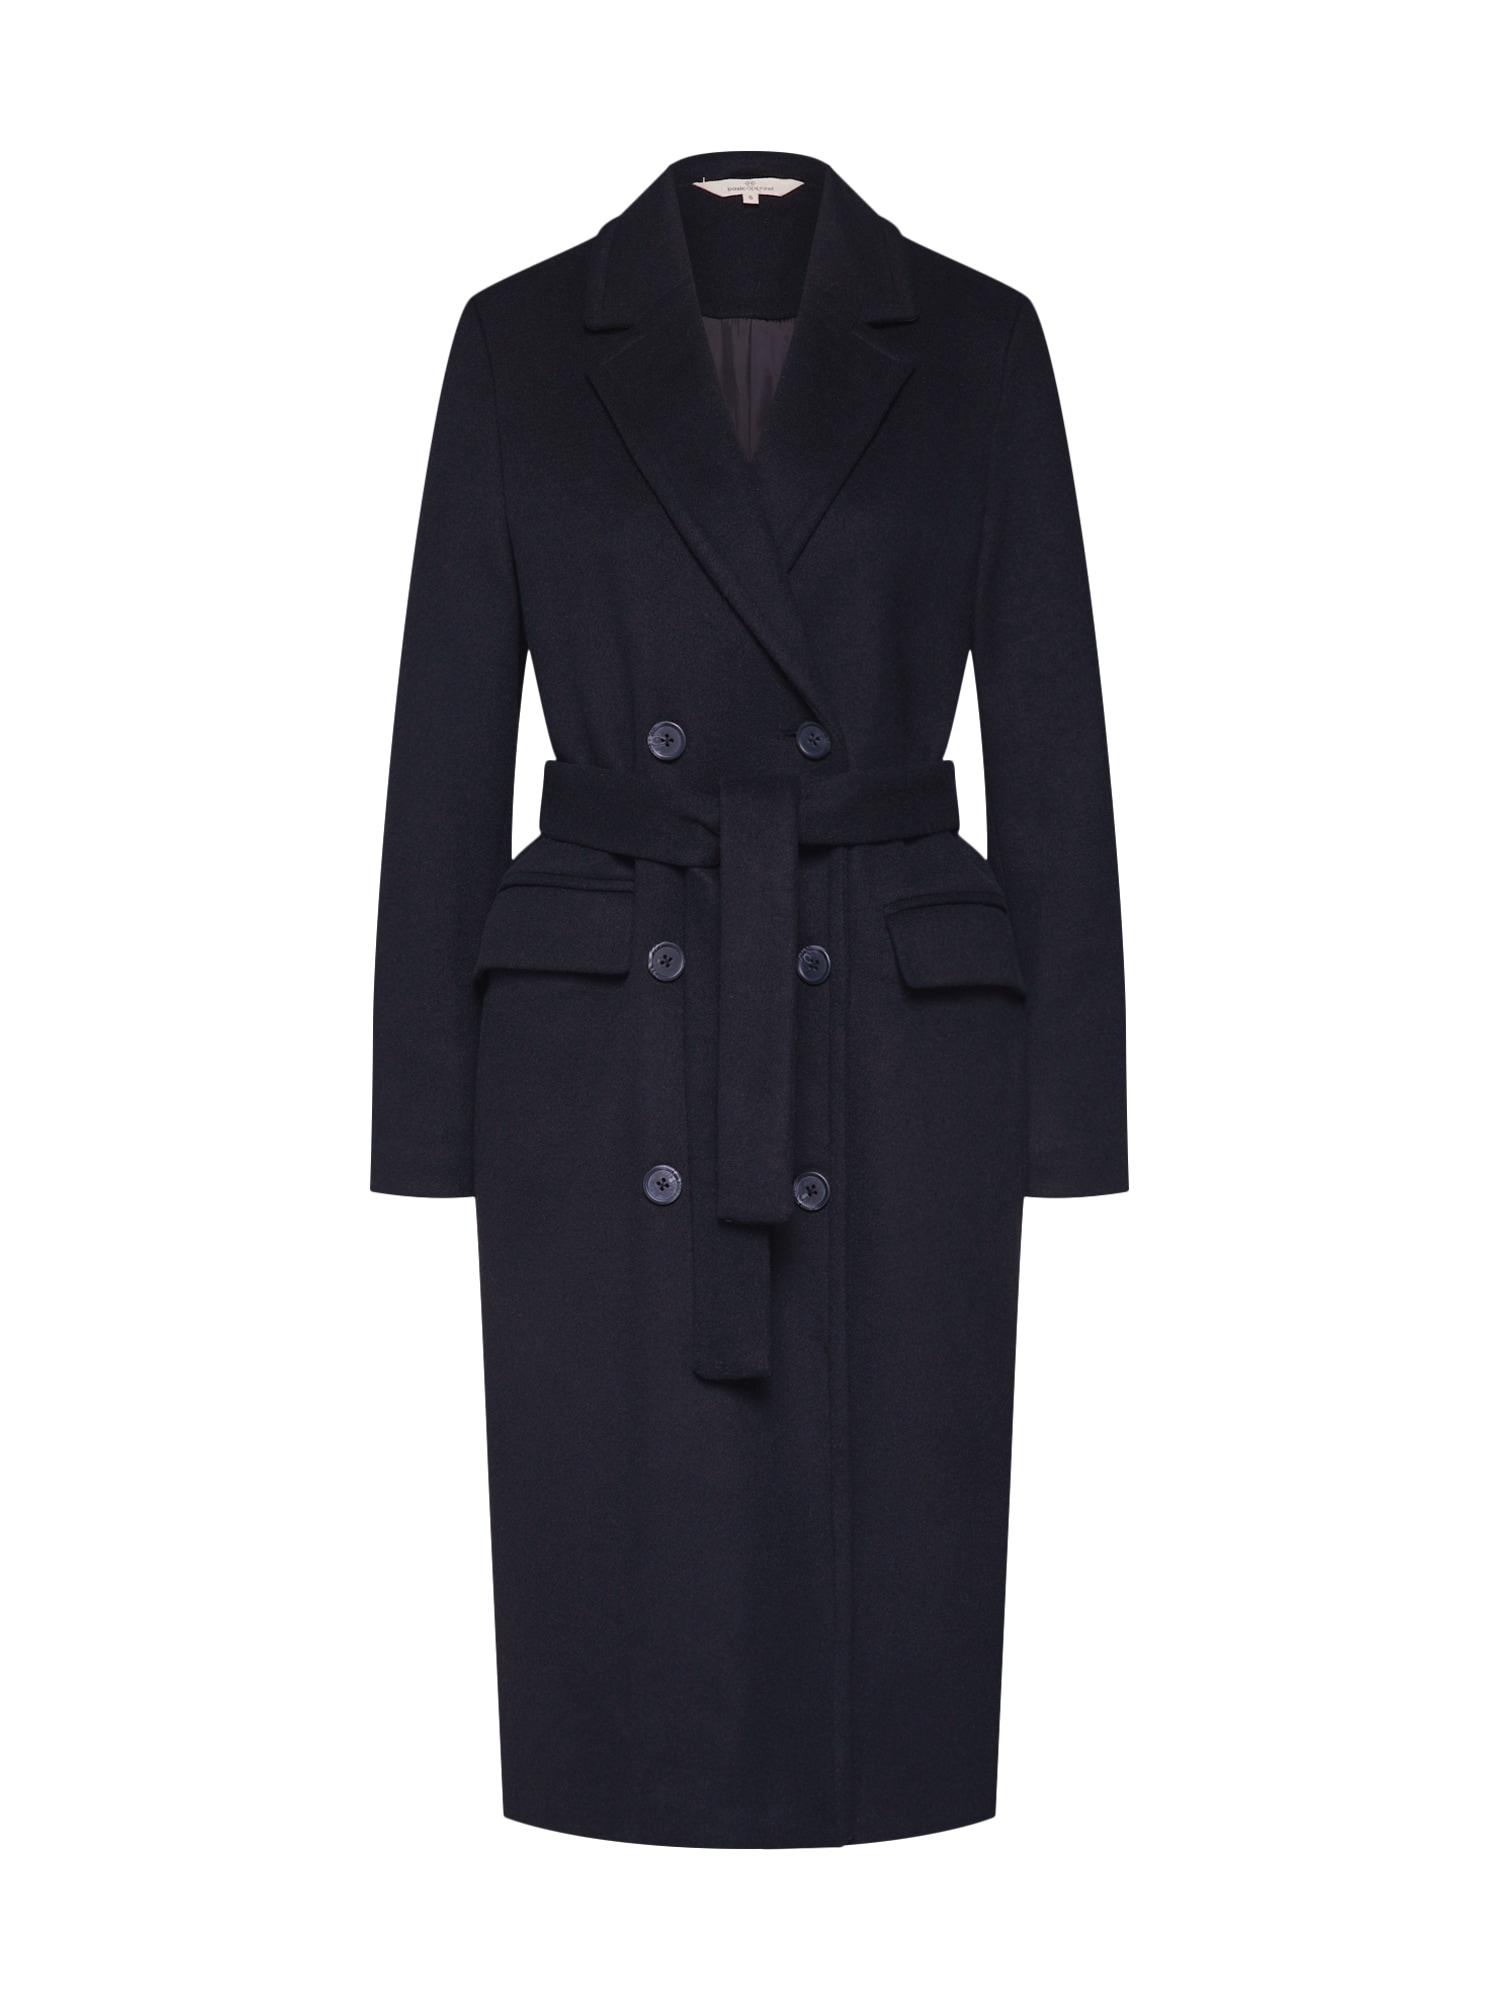 basic apparel Rudeninis-žieminis paltas 'Clara coat' juoda